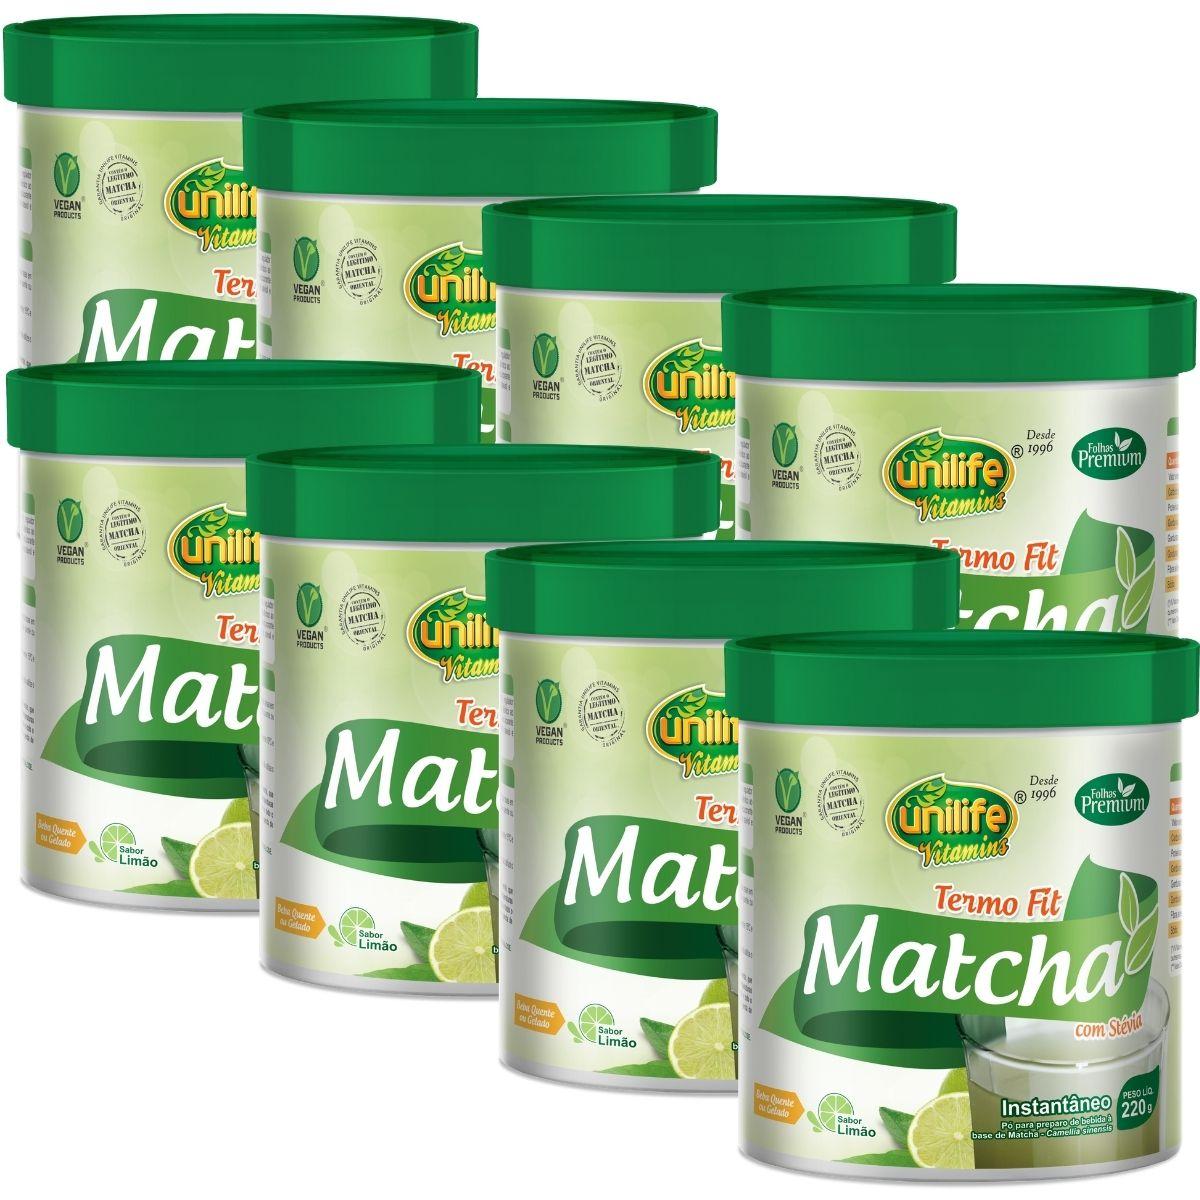 Kit 8 Matcha Instantâneo C/ Stévia Termo Fit Unilife - 220g Sabor: Limão